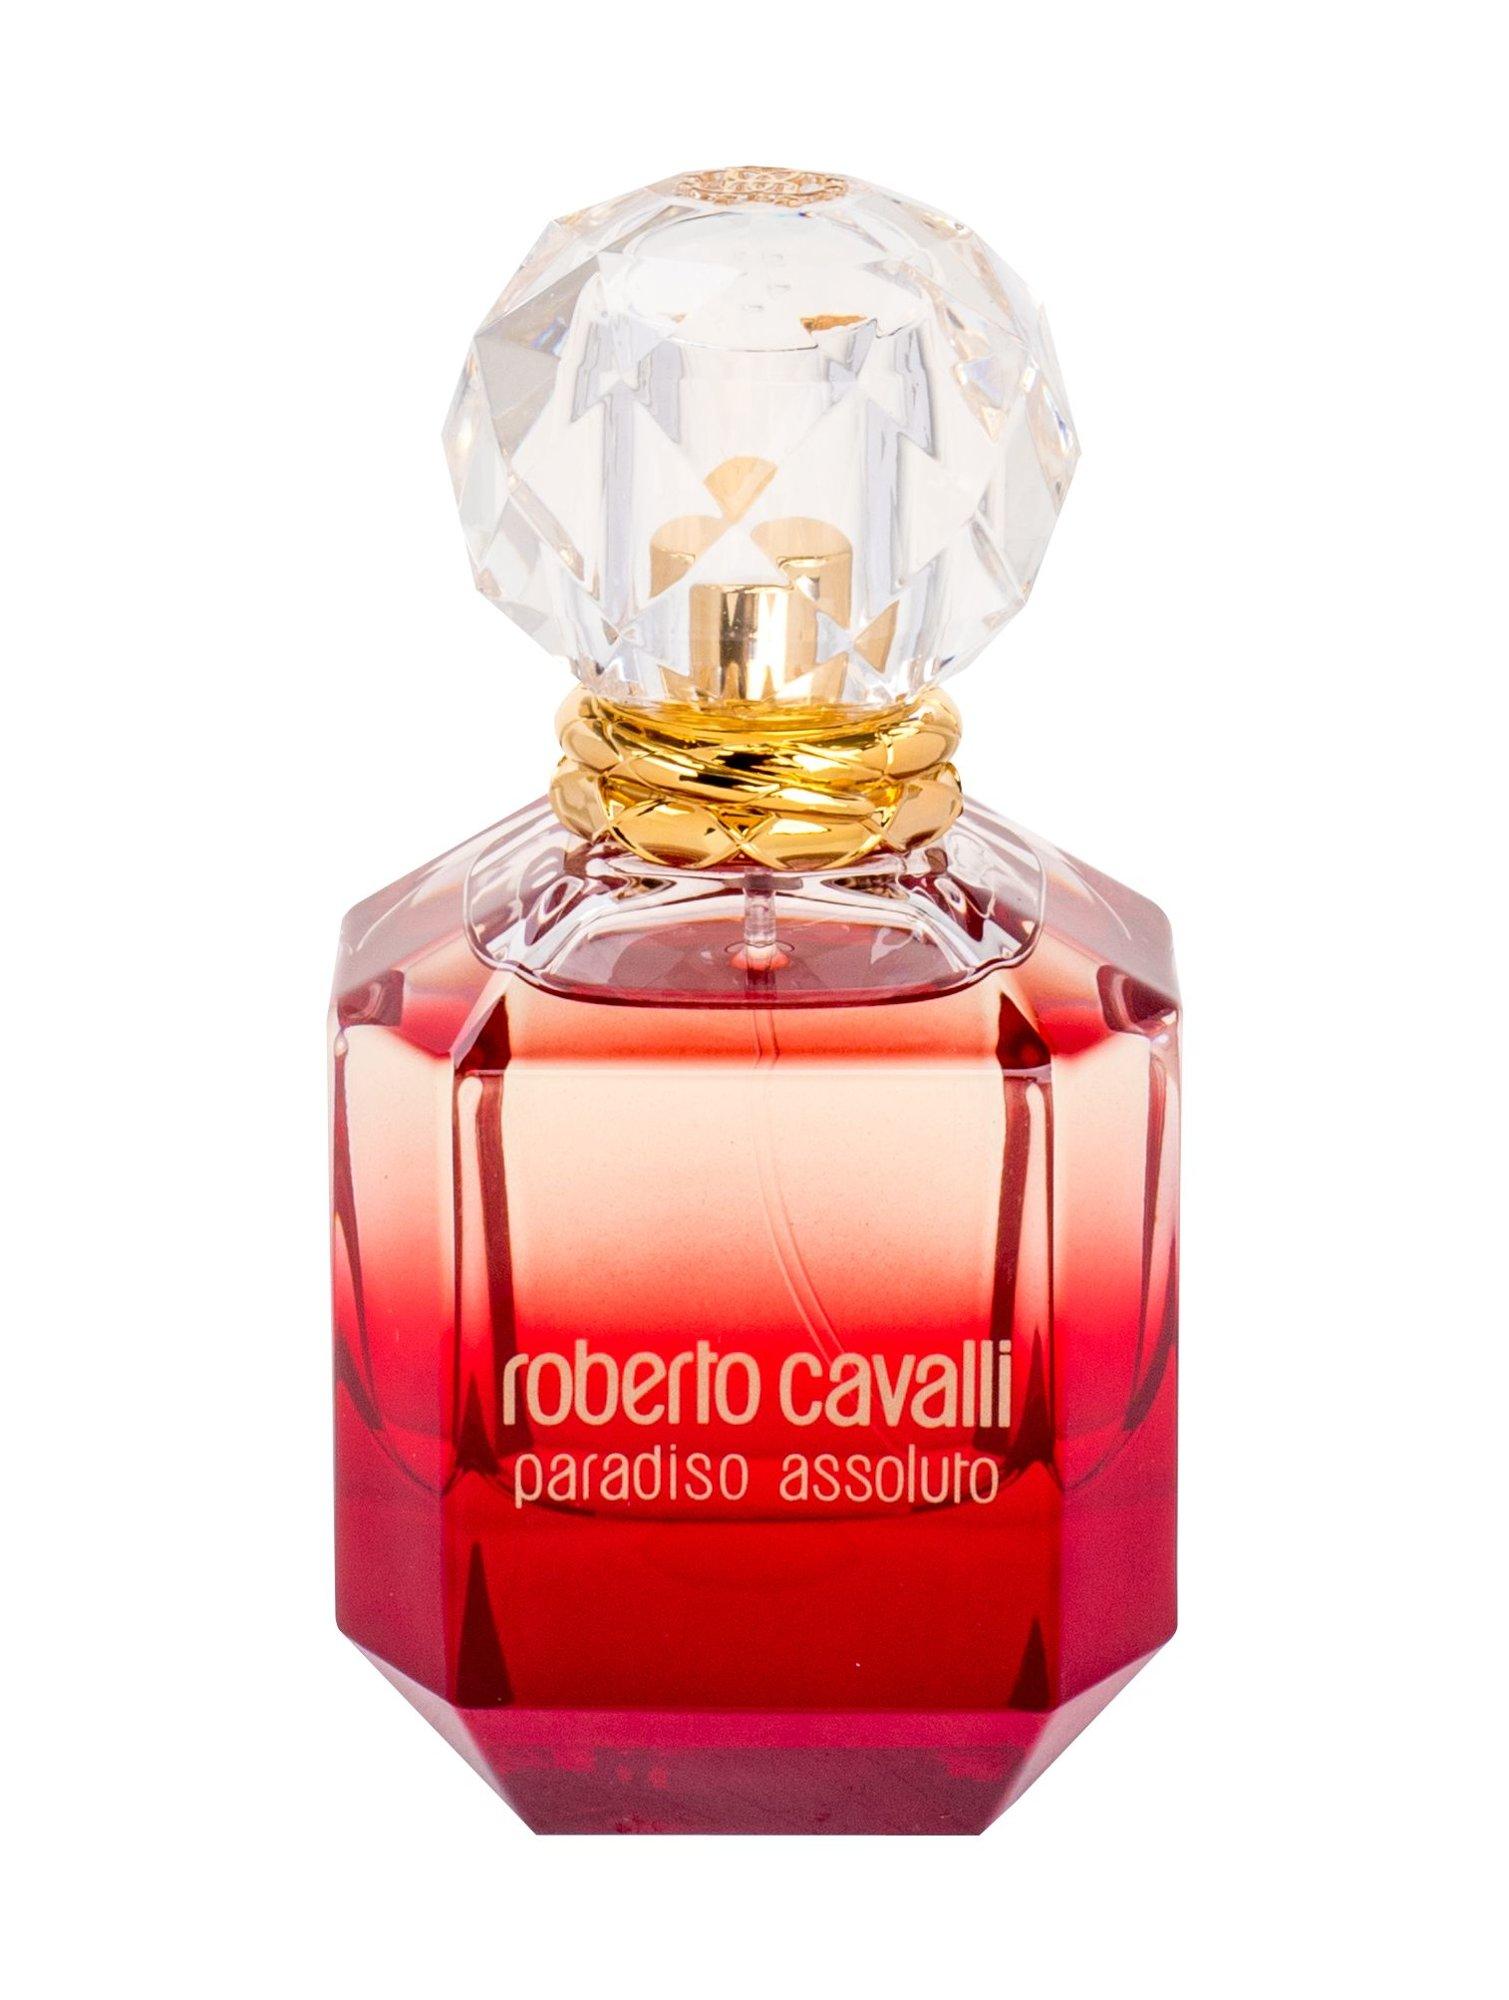 Roberto Cavalli Paradiso Assoluto EDP 50ml